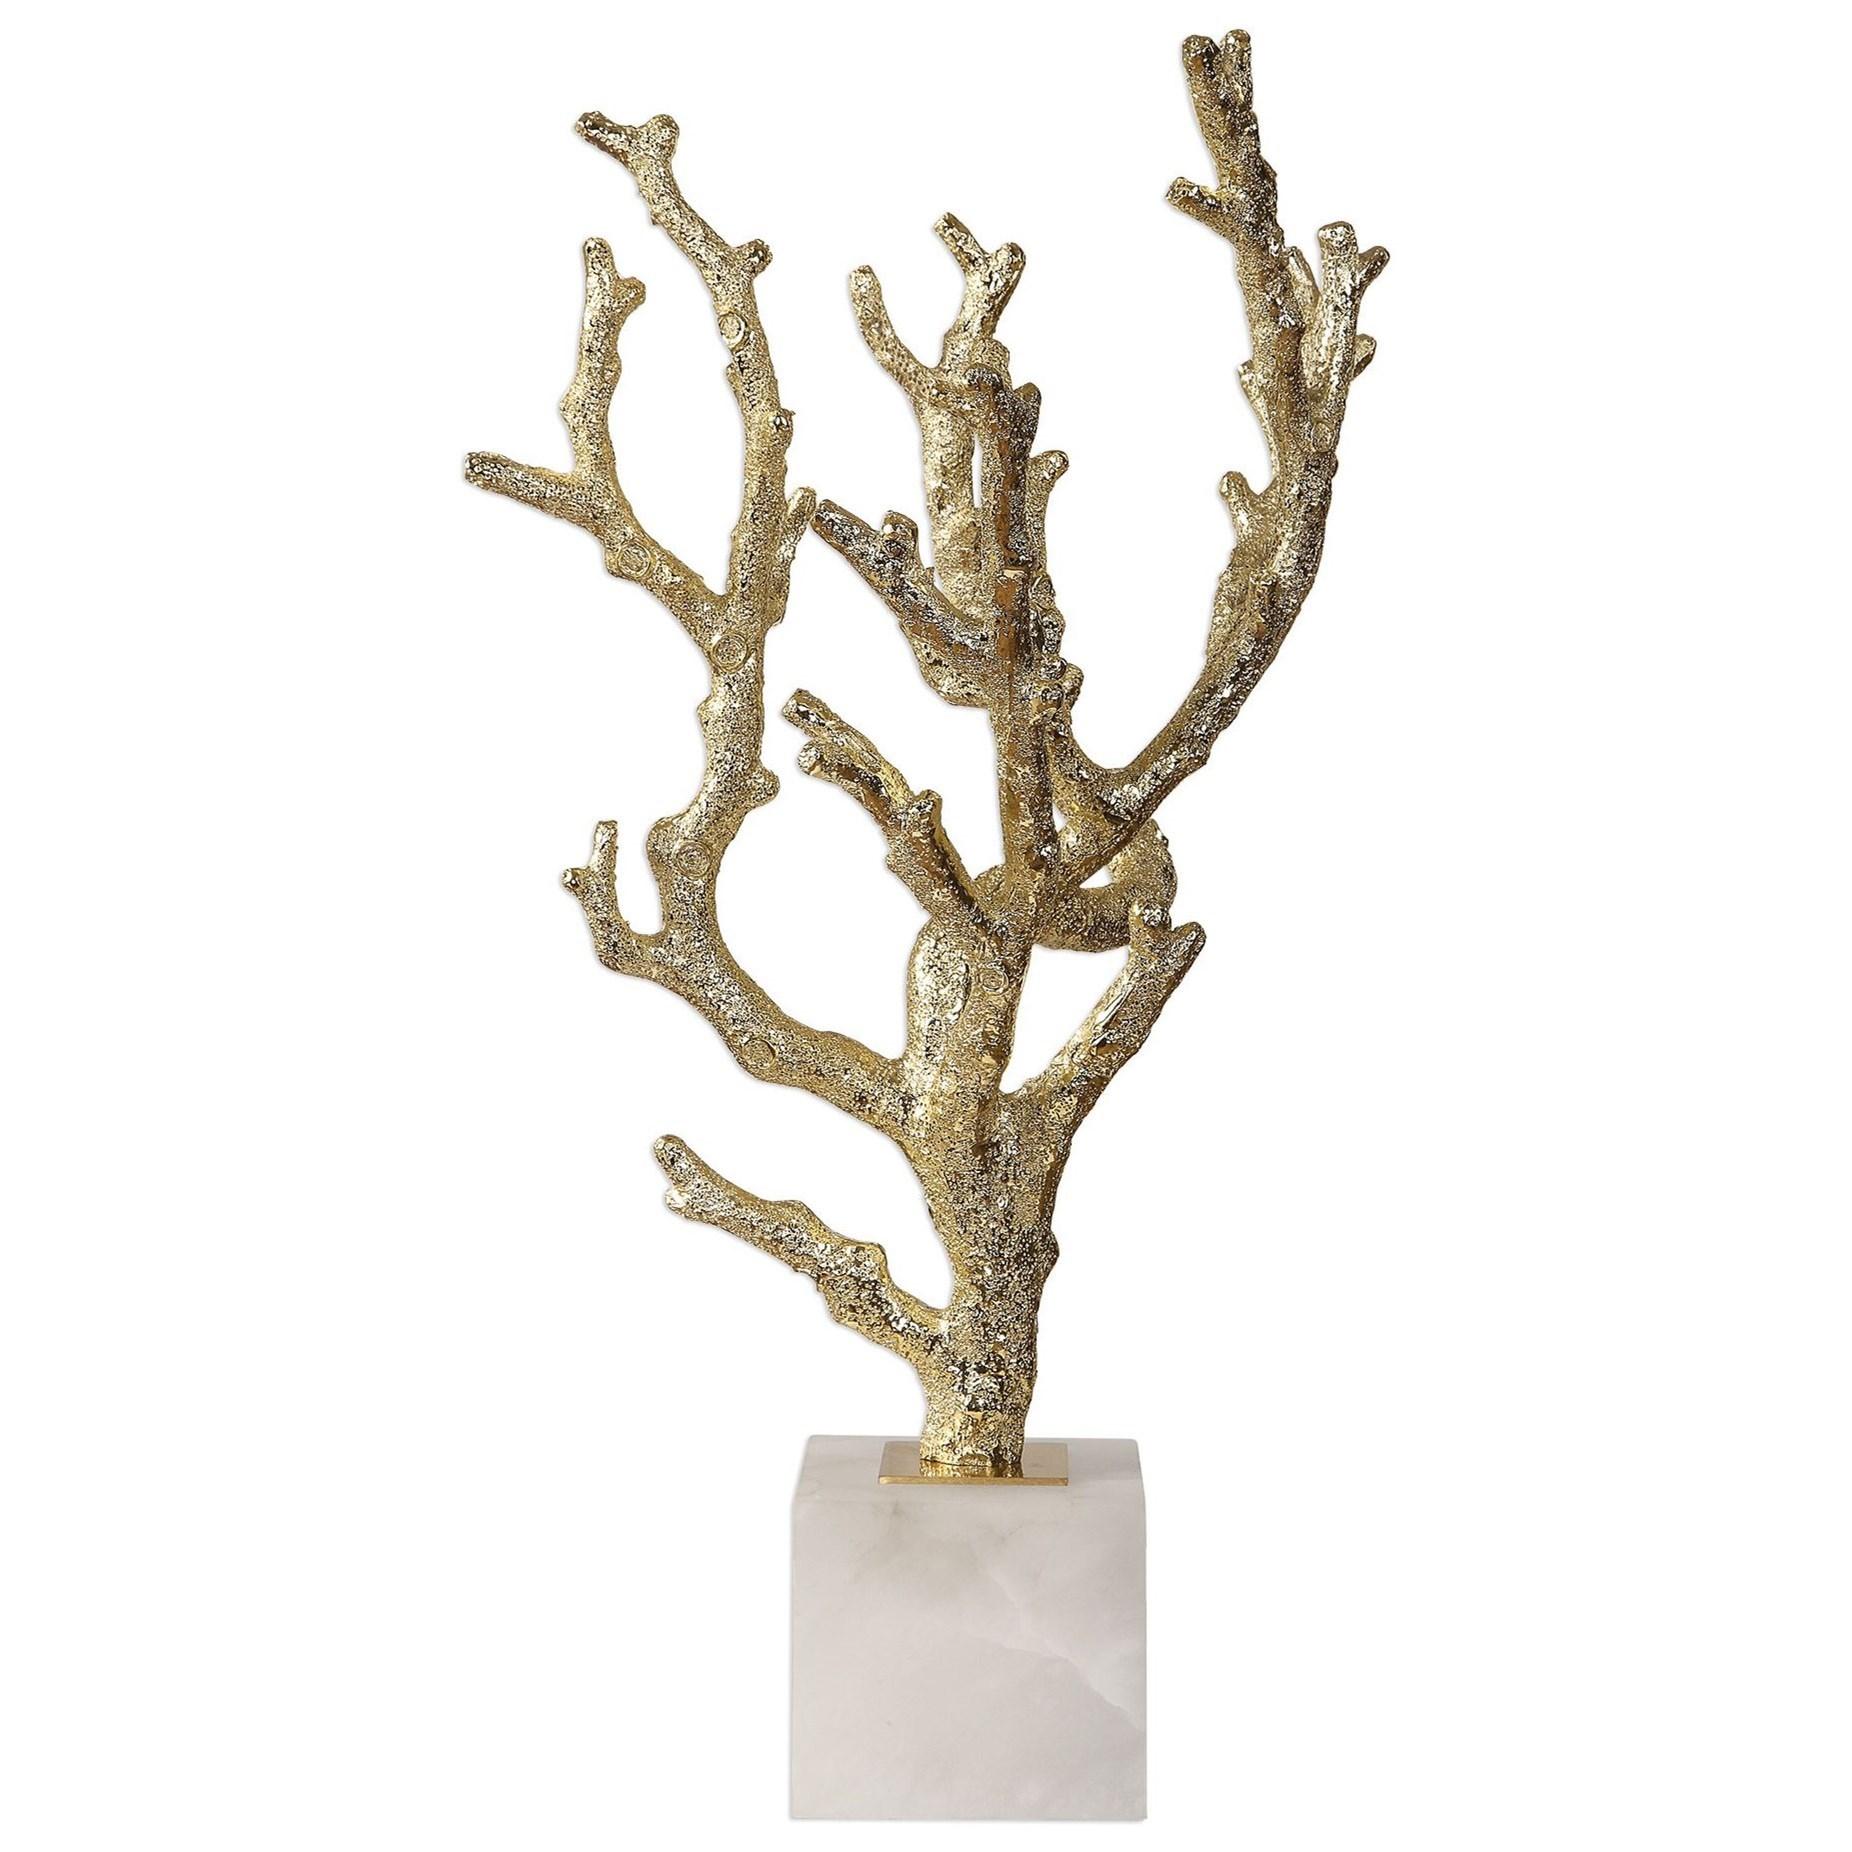 Coraline Silver Coral Sculptures